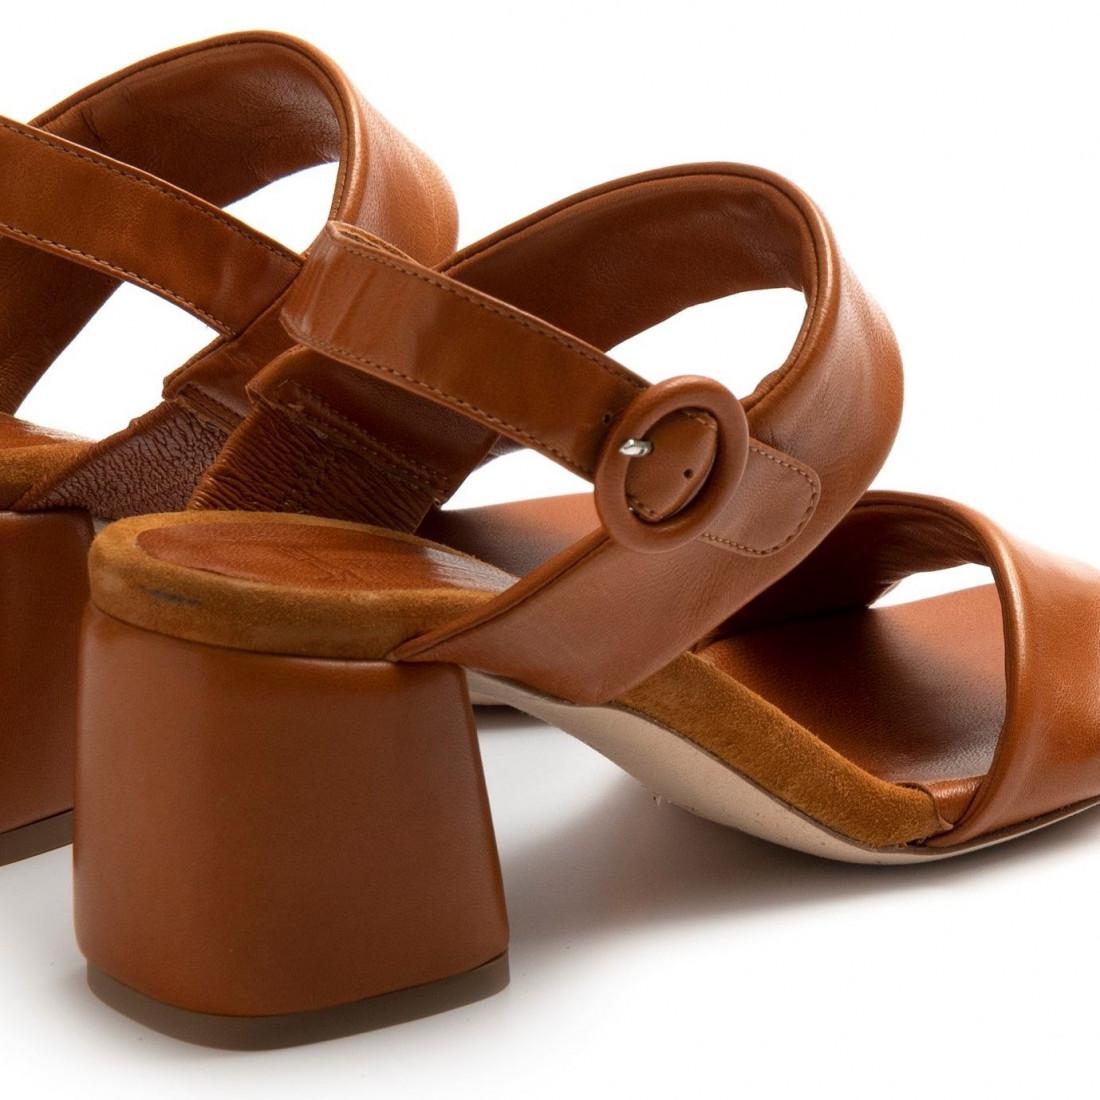 sandali donna lorenzo masiero 21113spicy brown 8577